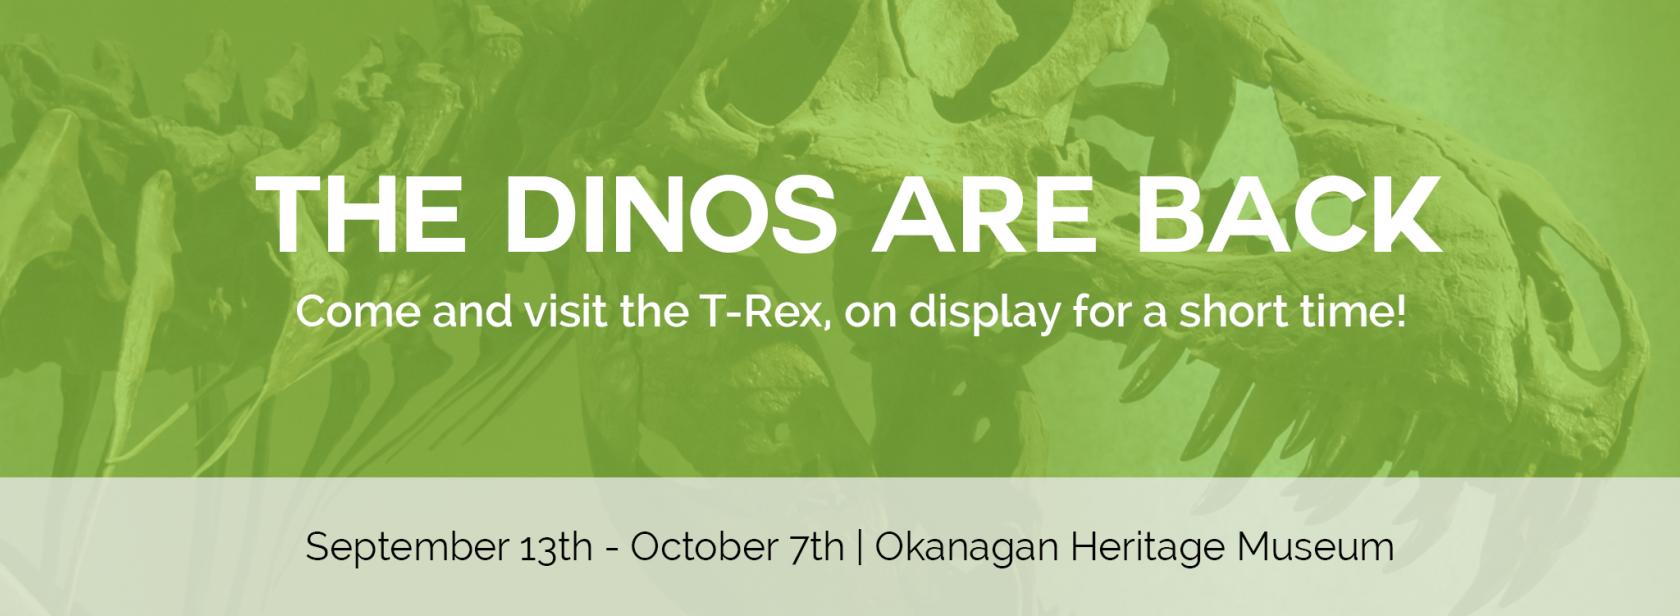 Dino exhibit kelowna museums slider 2 Home